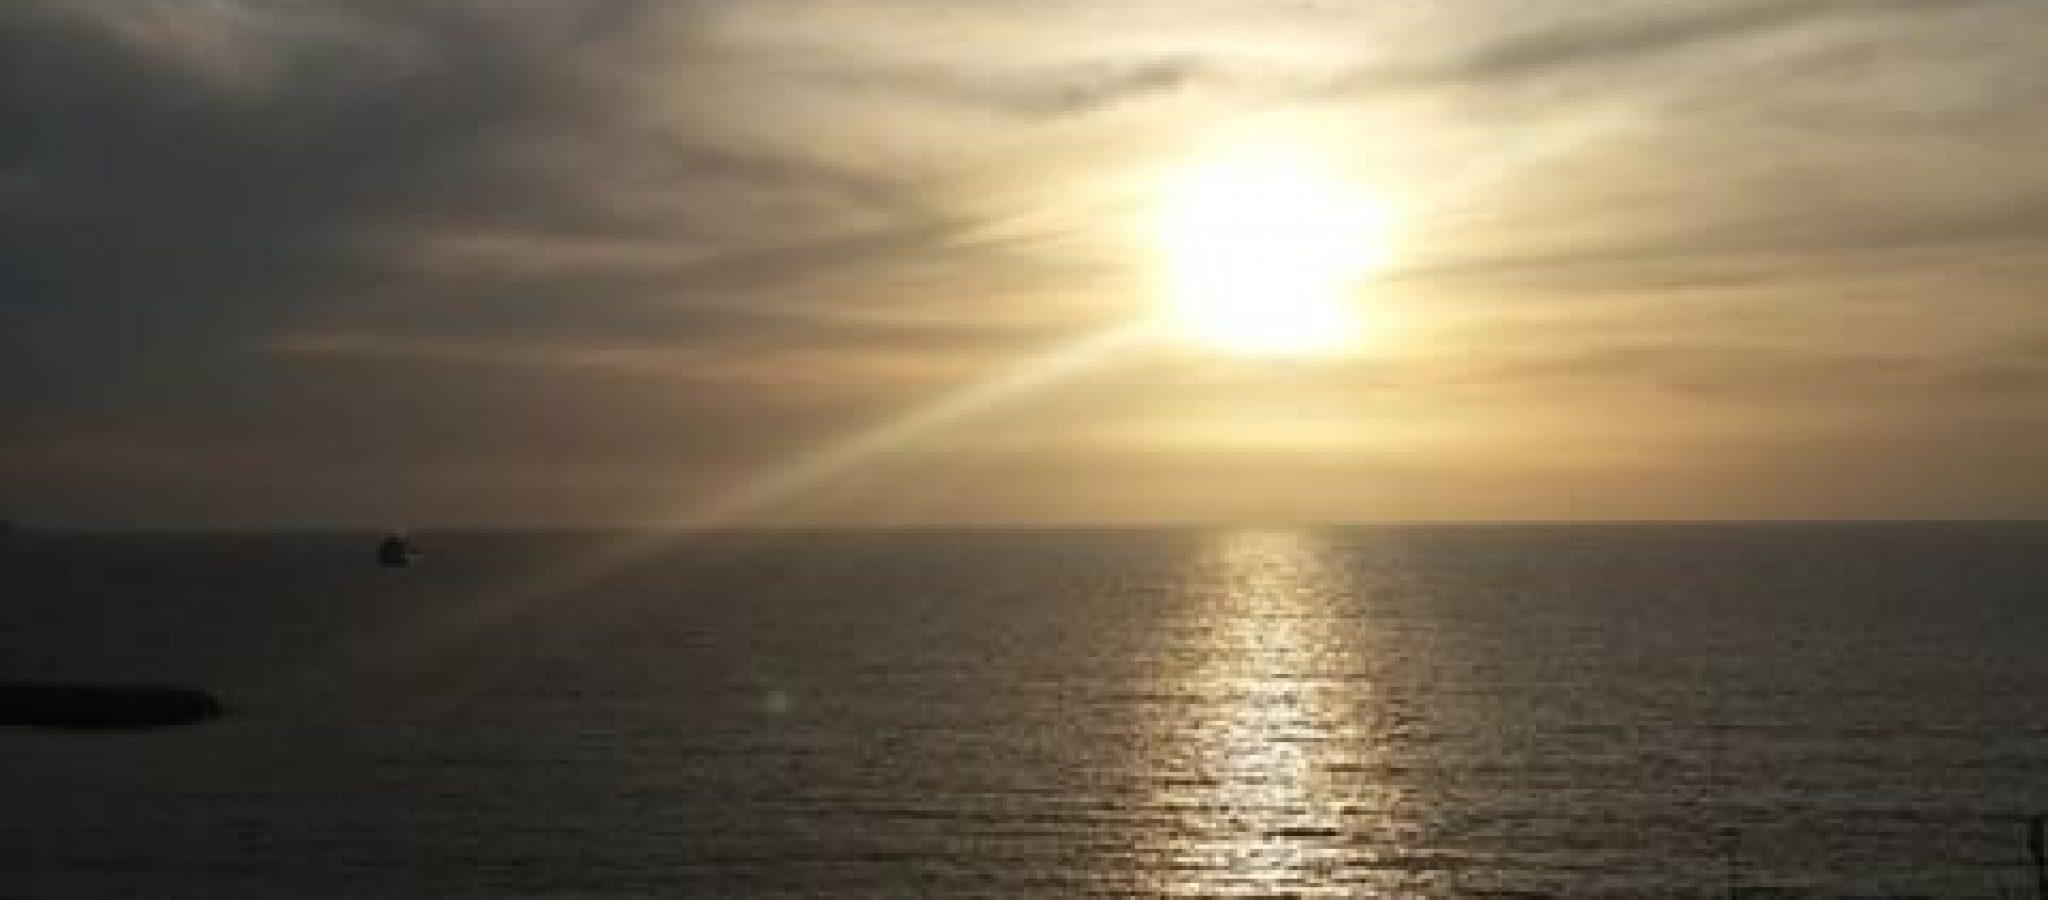 HAYALI BAY - Lebanon – A splendid scenery by the beach awaits you.